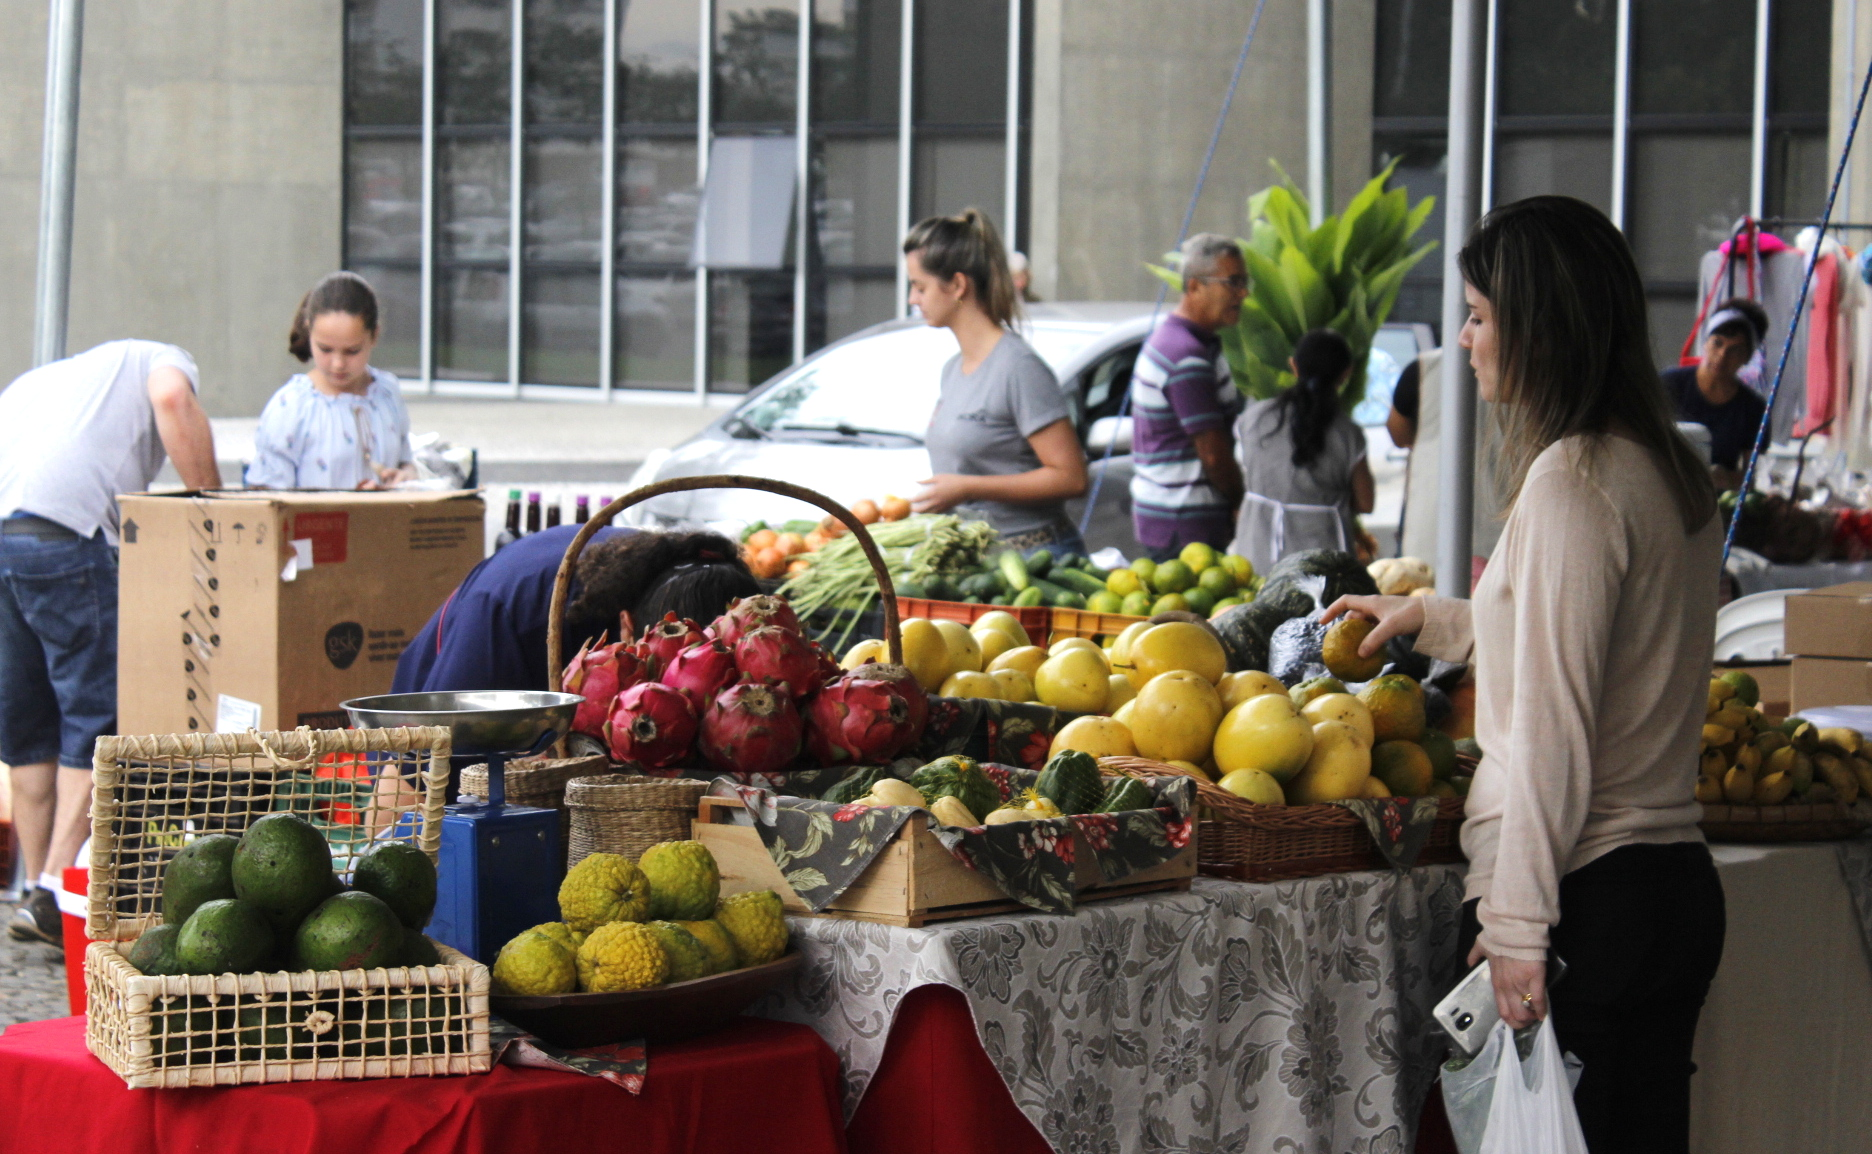 Feira da Agricultura Familiar atrai moradores e beneficia agricultores no Paço Municipal Marcos Rovaris